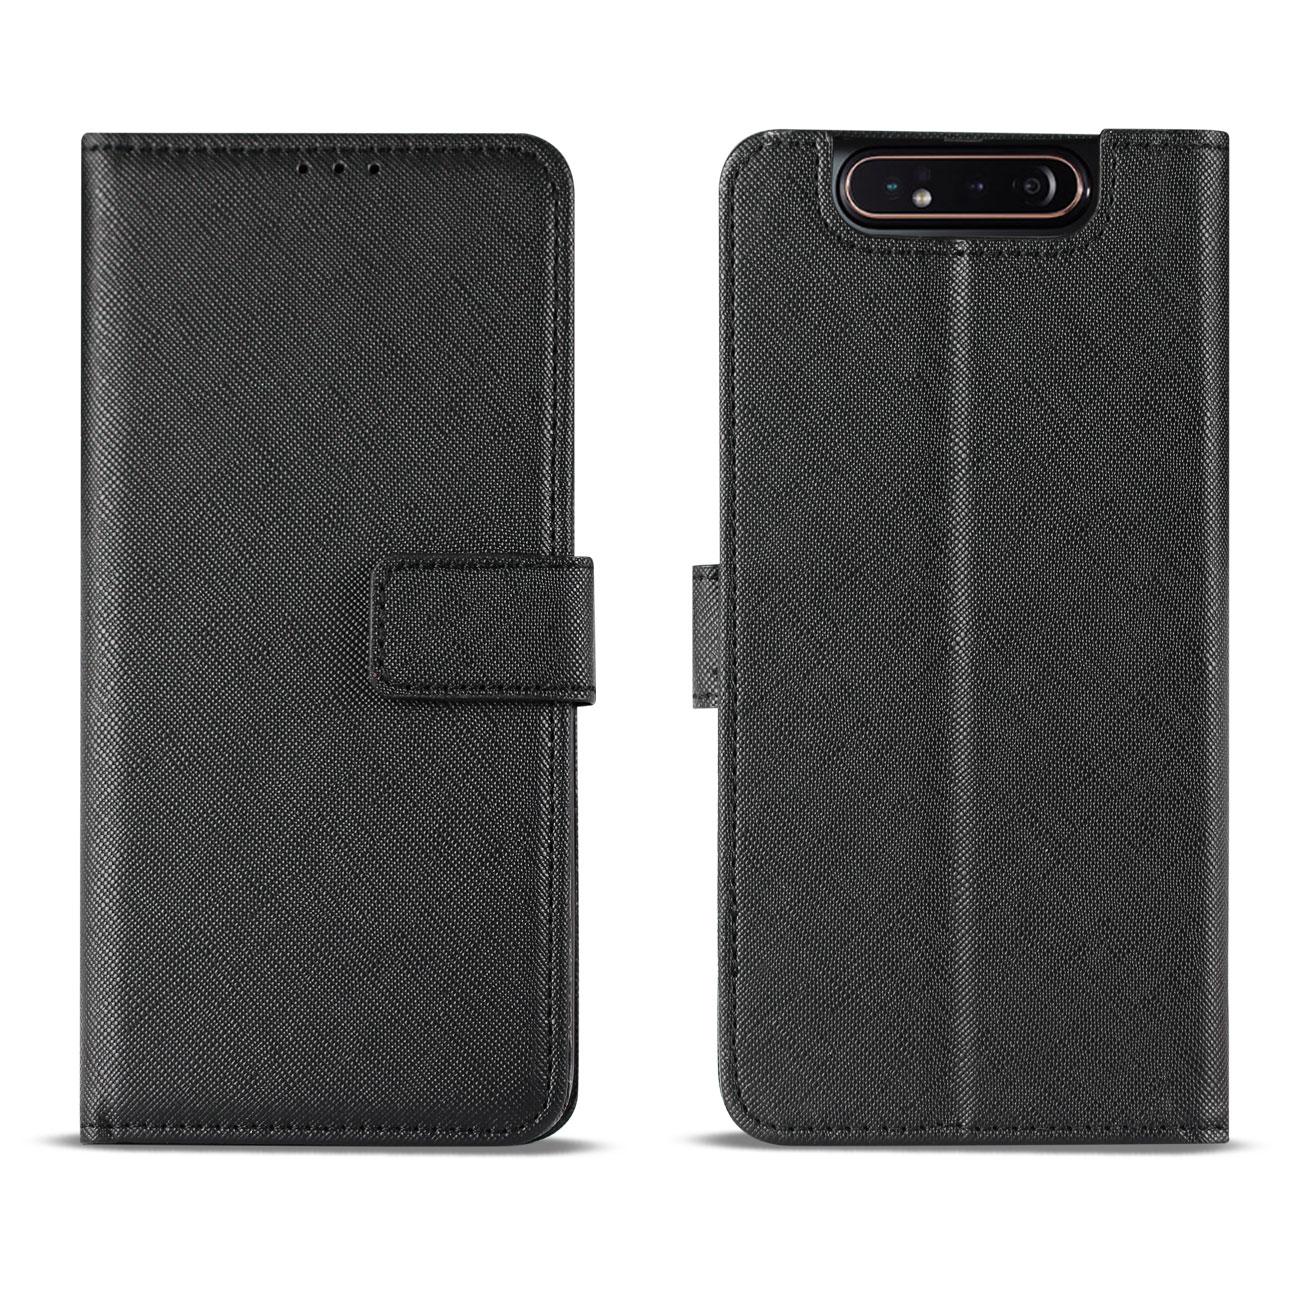 SAMSUNG GALAXY A80 3-In-1 Wallet Case In BLACK